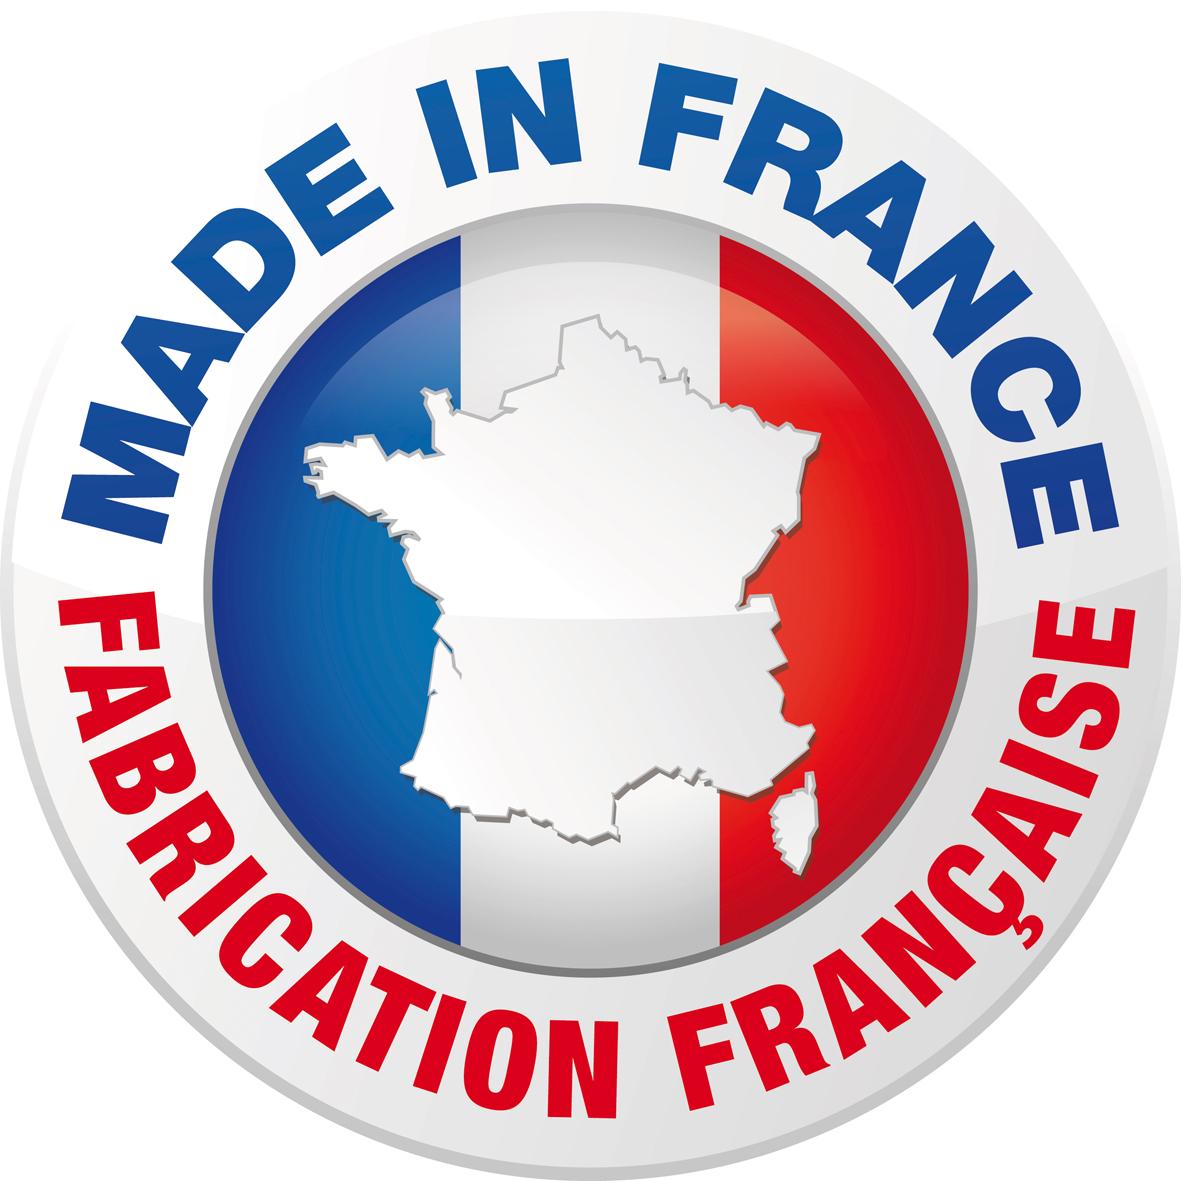 made-in-france%20(1).jpg